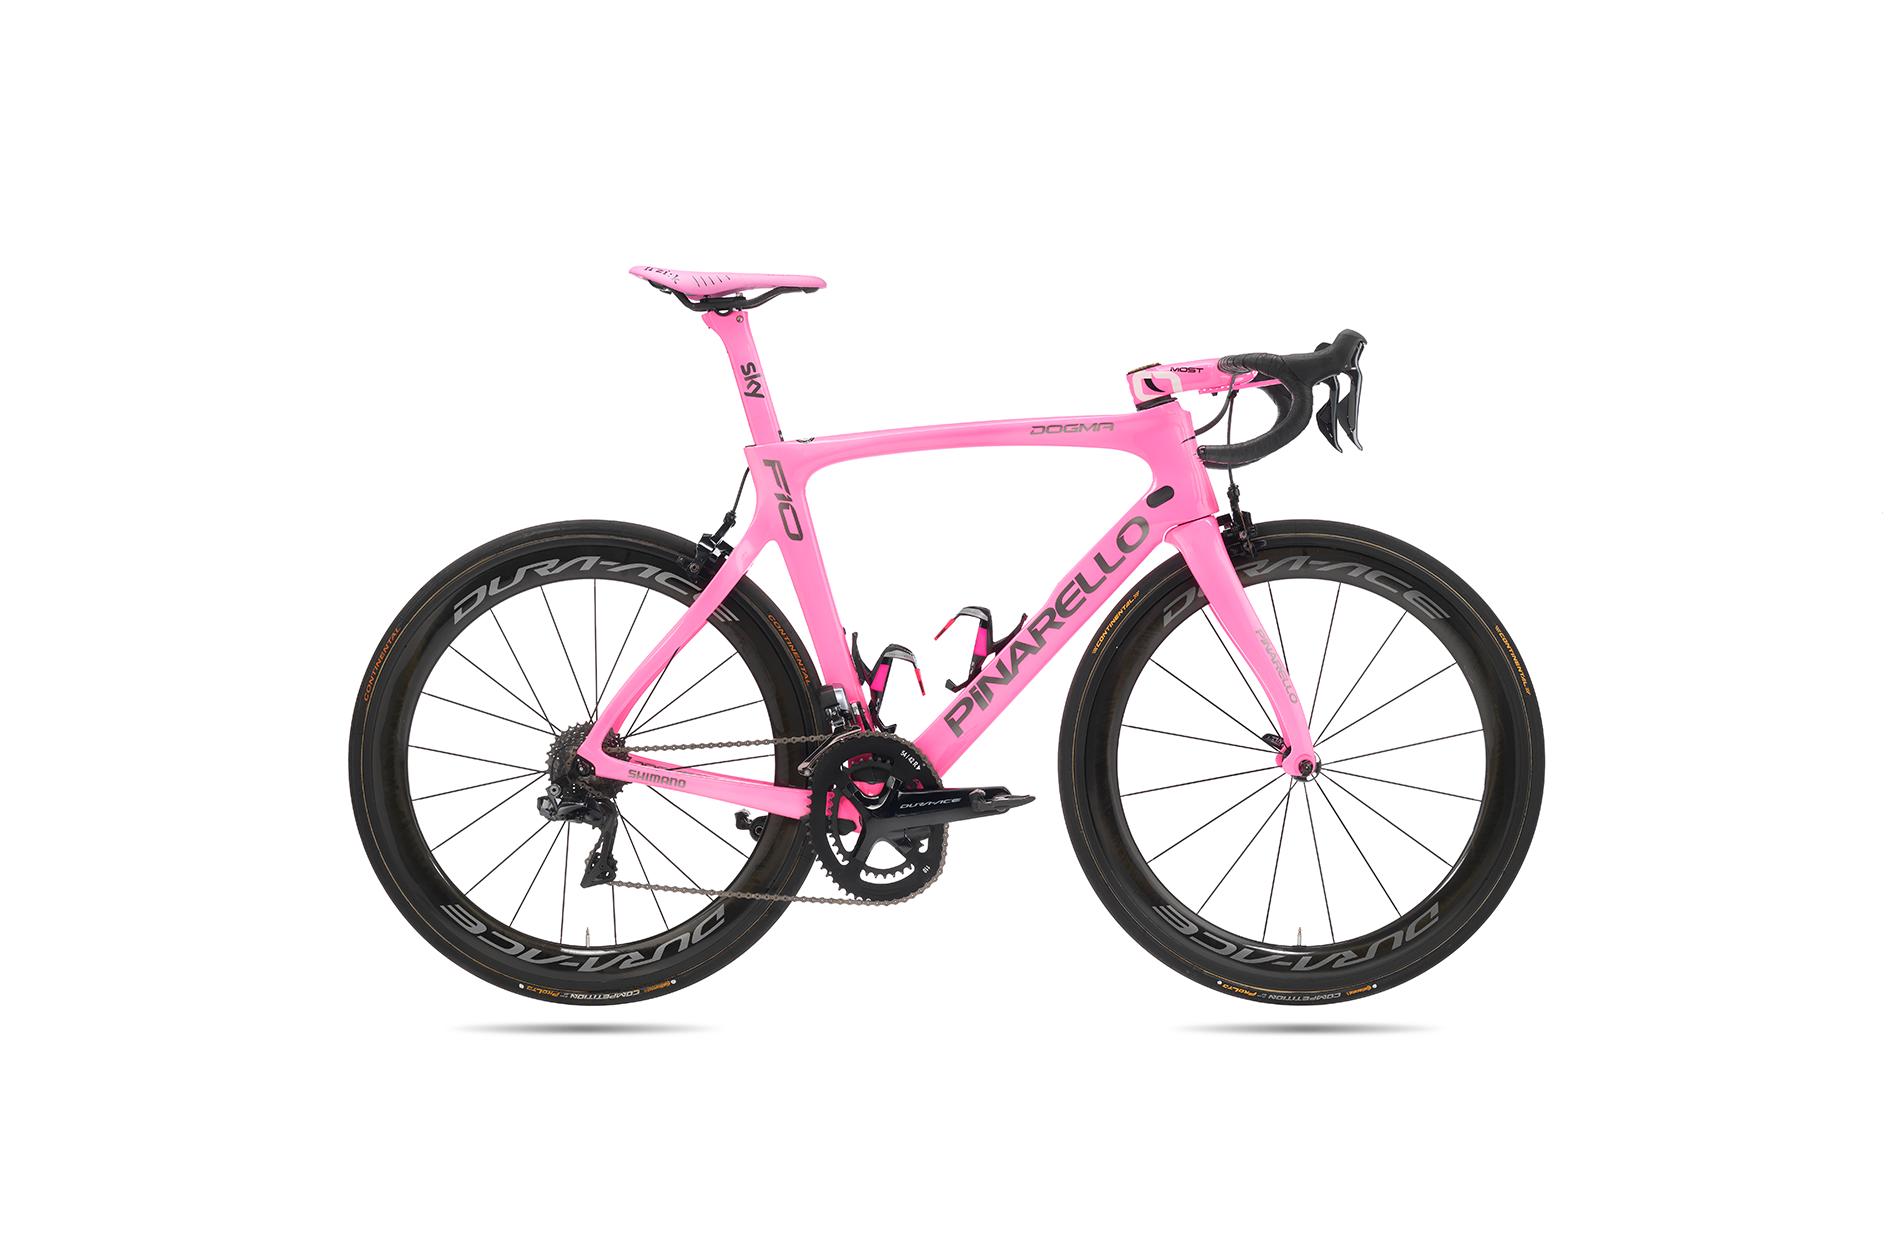 DOGMA_F10_GIRO-TOUR2018-218-Giro-Pink-2018